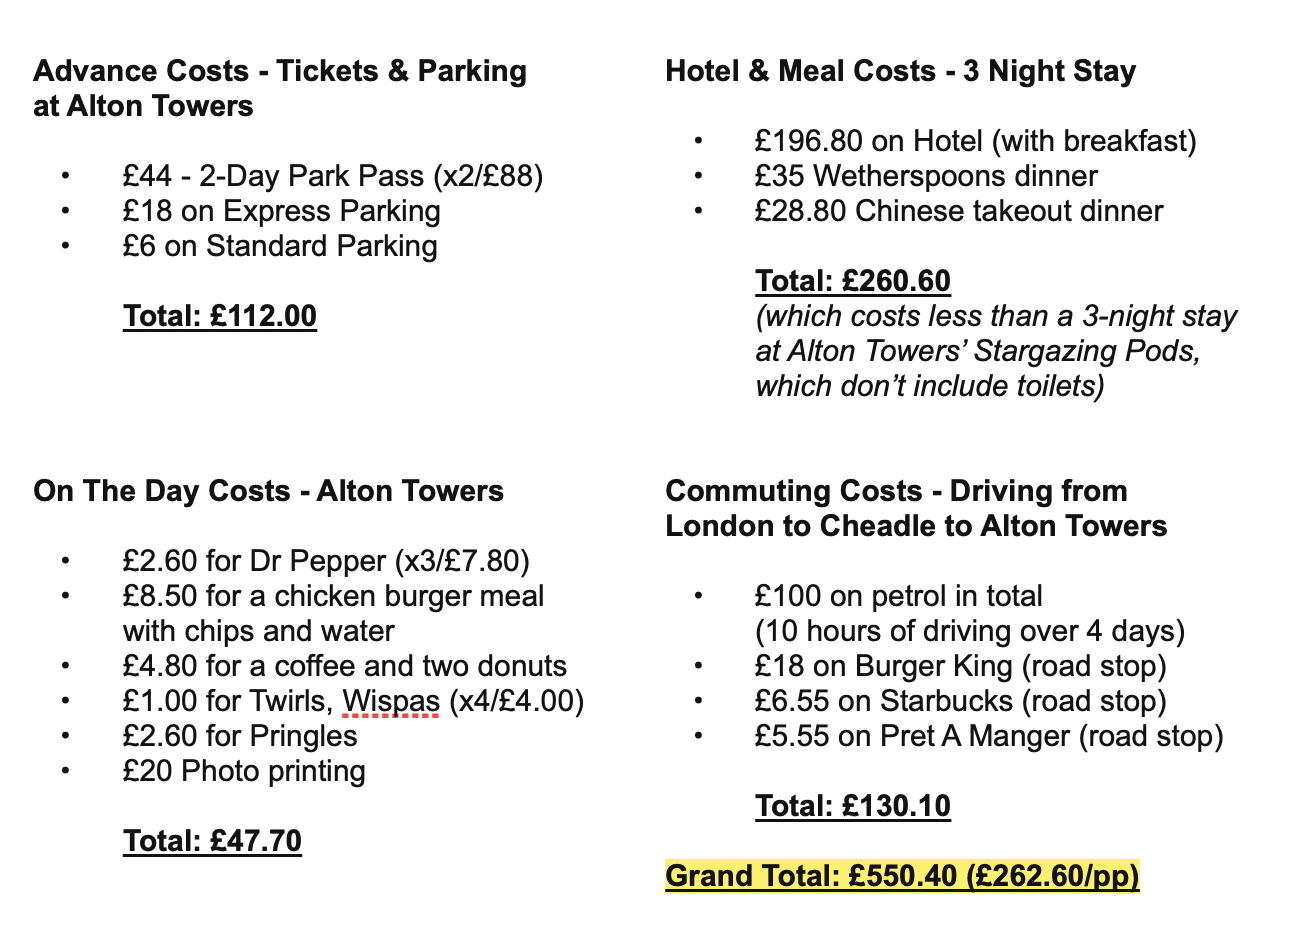 2021年5月伦敦至Cheadle.png公路旅行的Alton Towers预算